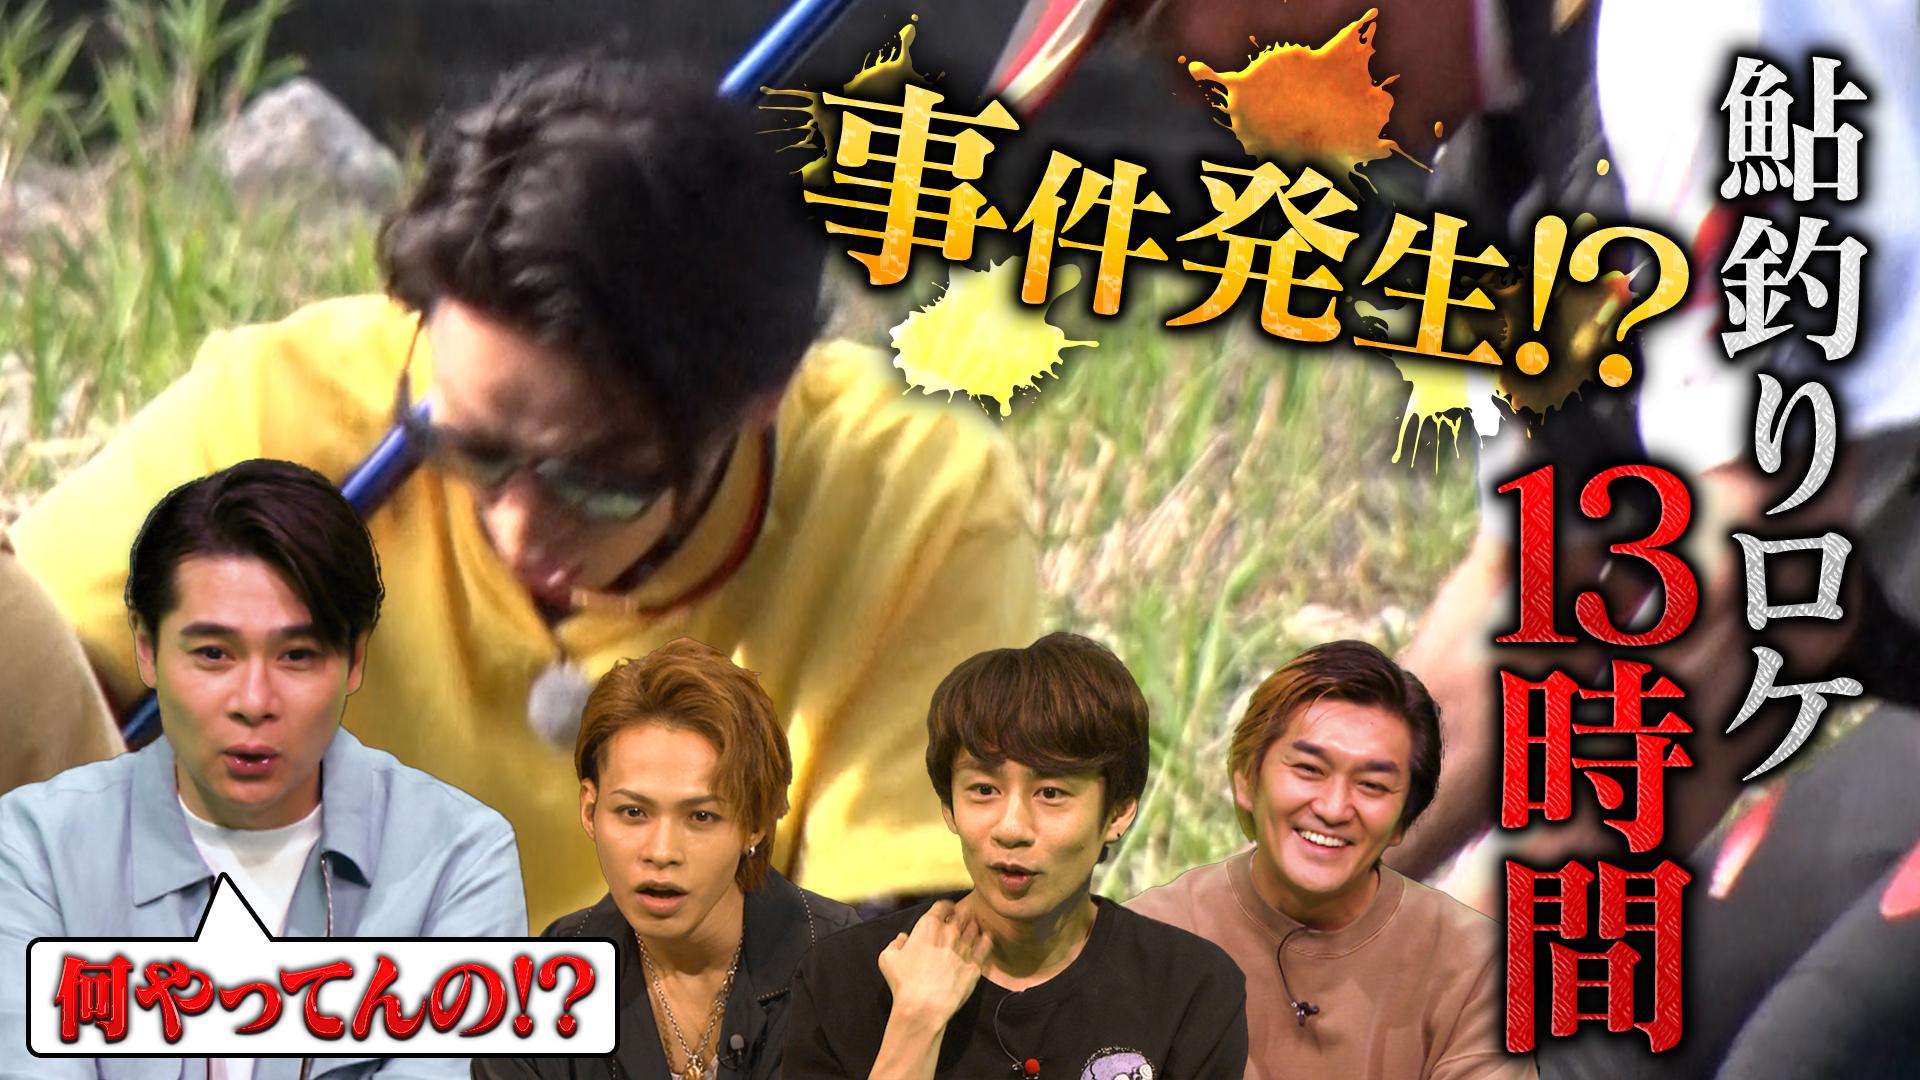 KAT-TUNの食宝ゲッットゥーン #14 食宝相手に油断は禁物!?最後の最後まで気の抜けない戦い!